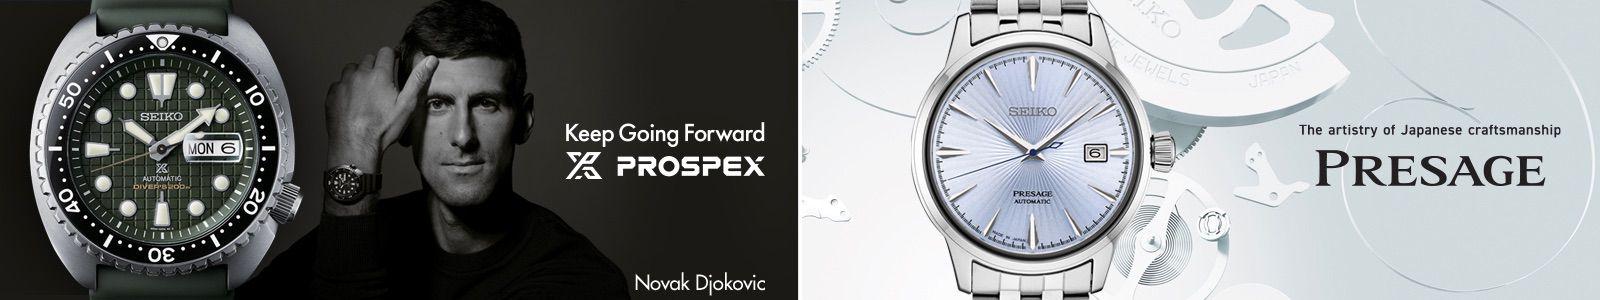 Keep Going Forward, Novak Djokovic, The artistry of japanese craftsmanship, Presage